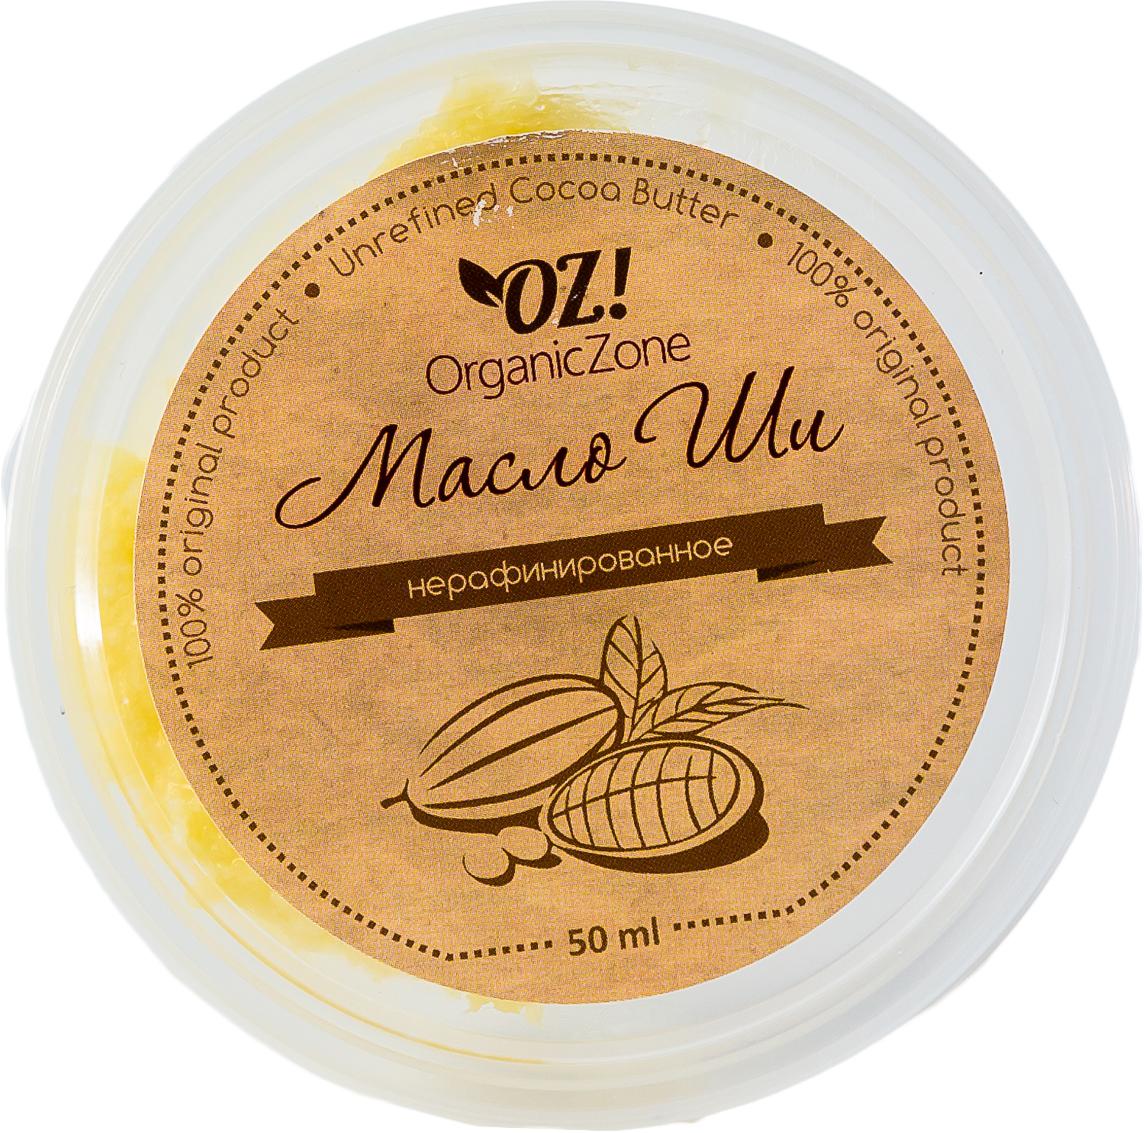 OrganicZone Масло ши каритэ нерафинированное, 50 мл